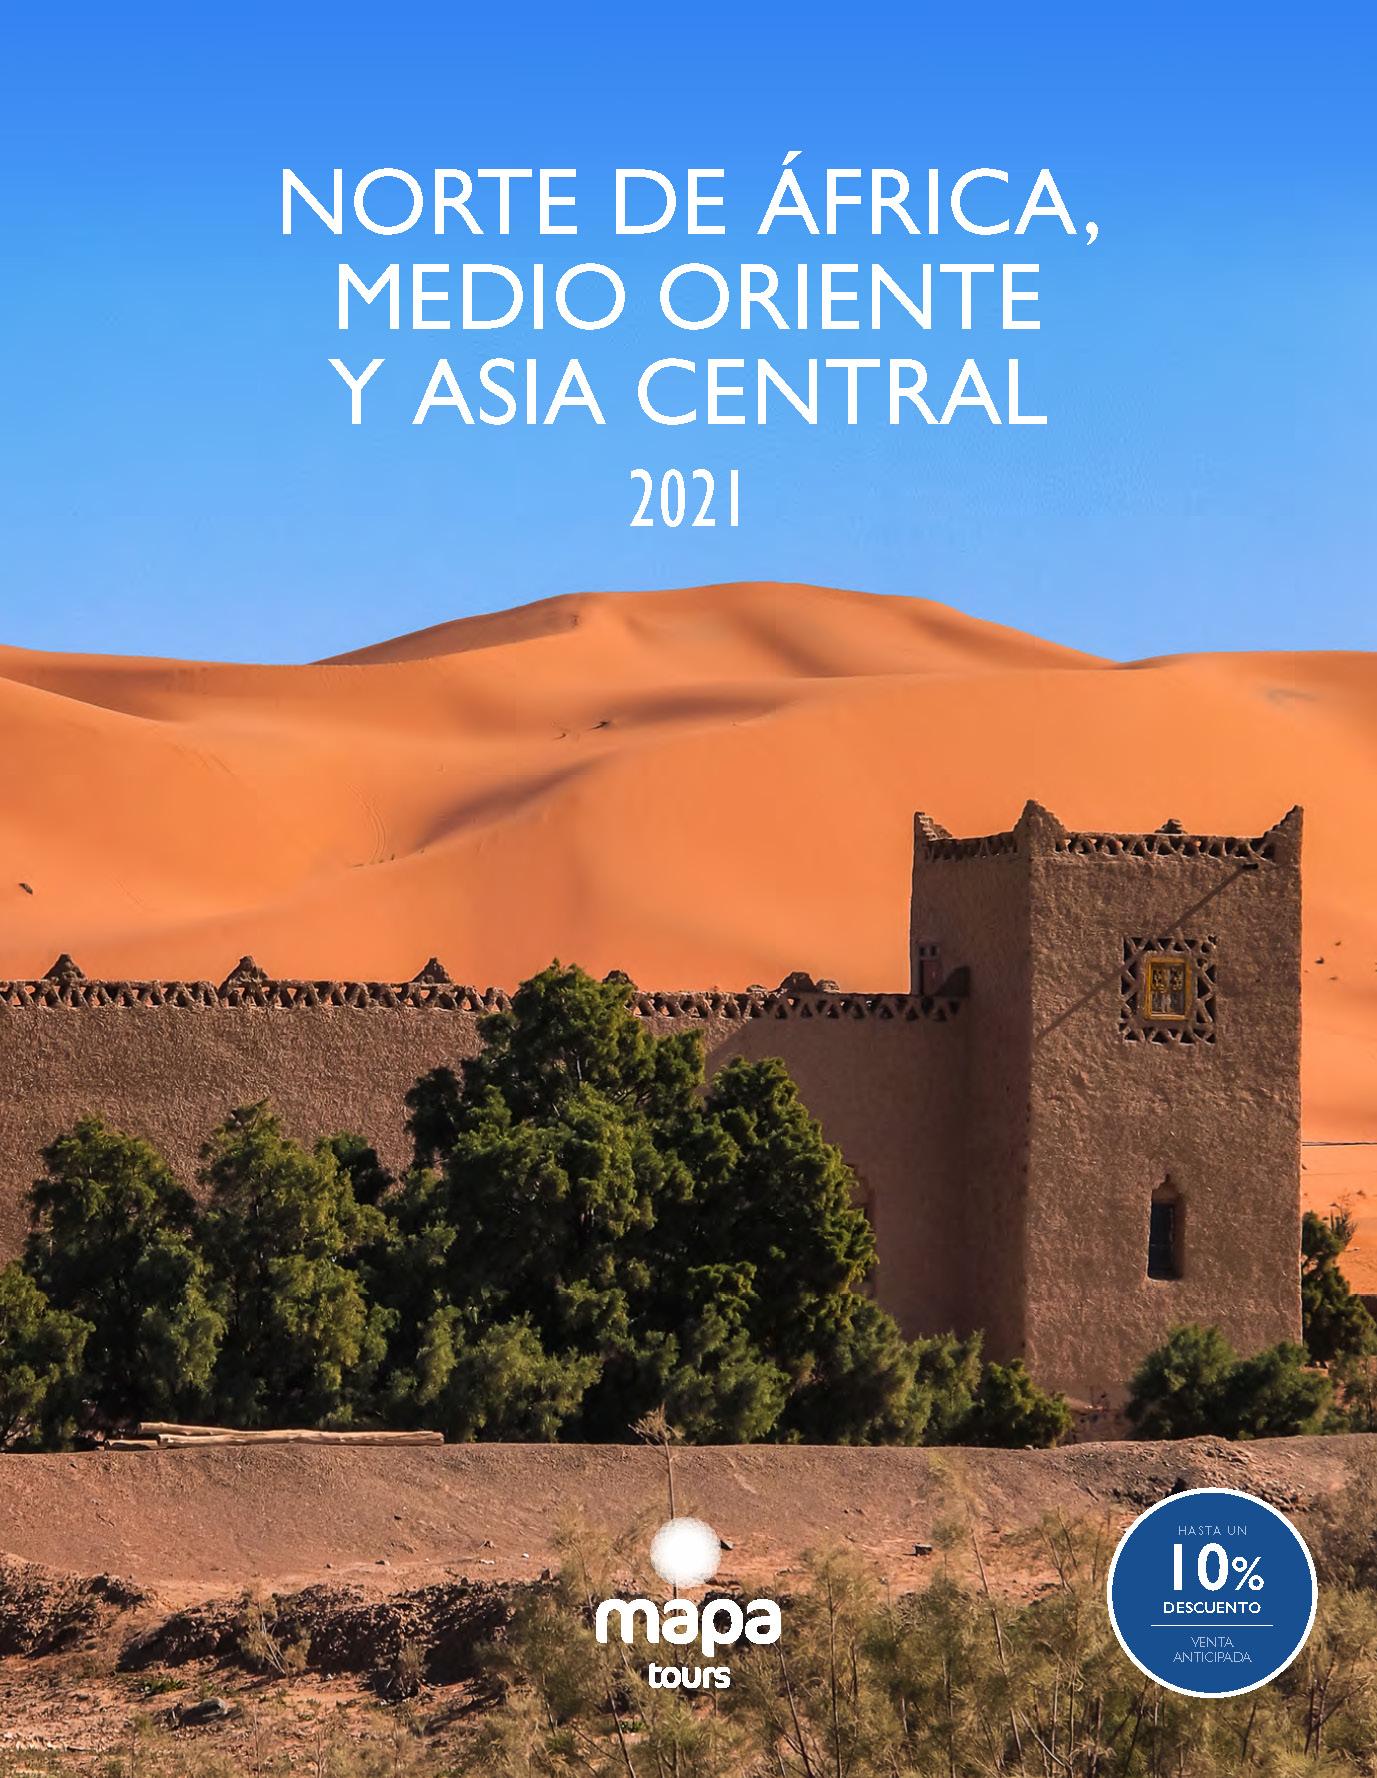 Catalogo Mapa Tours Oriente Medio Norte de Africa y Asia Central 2021